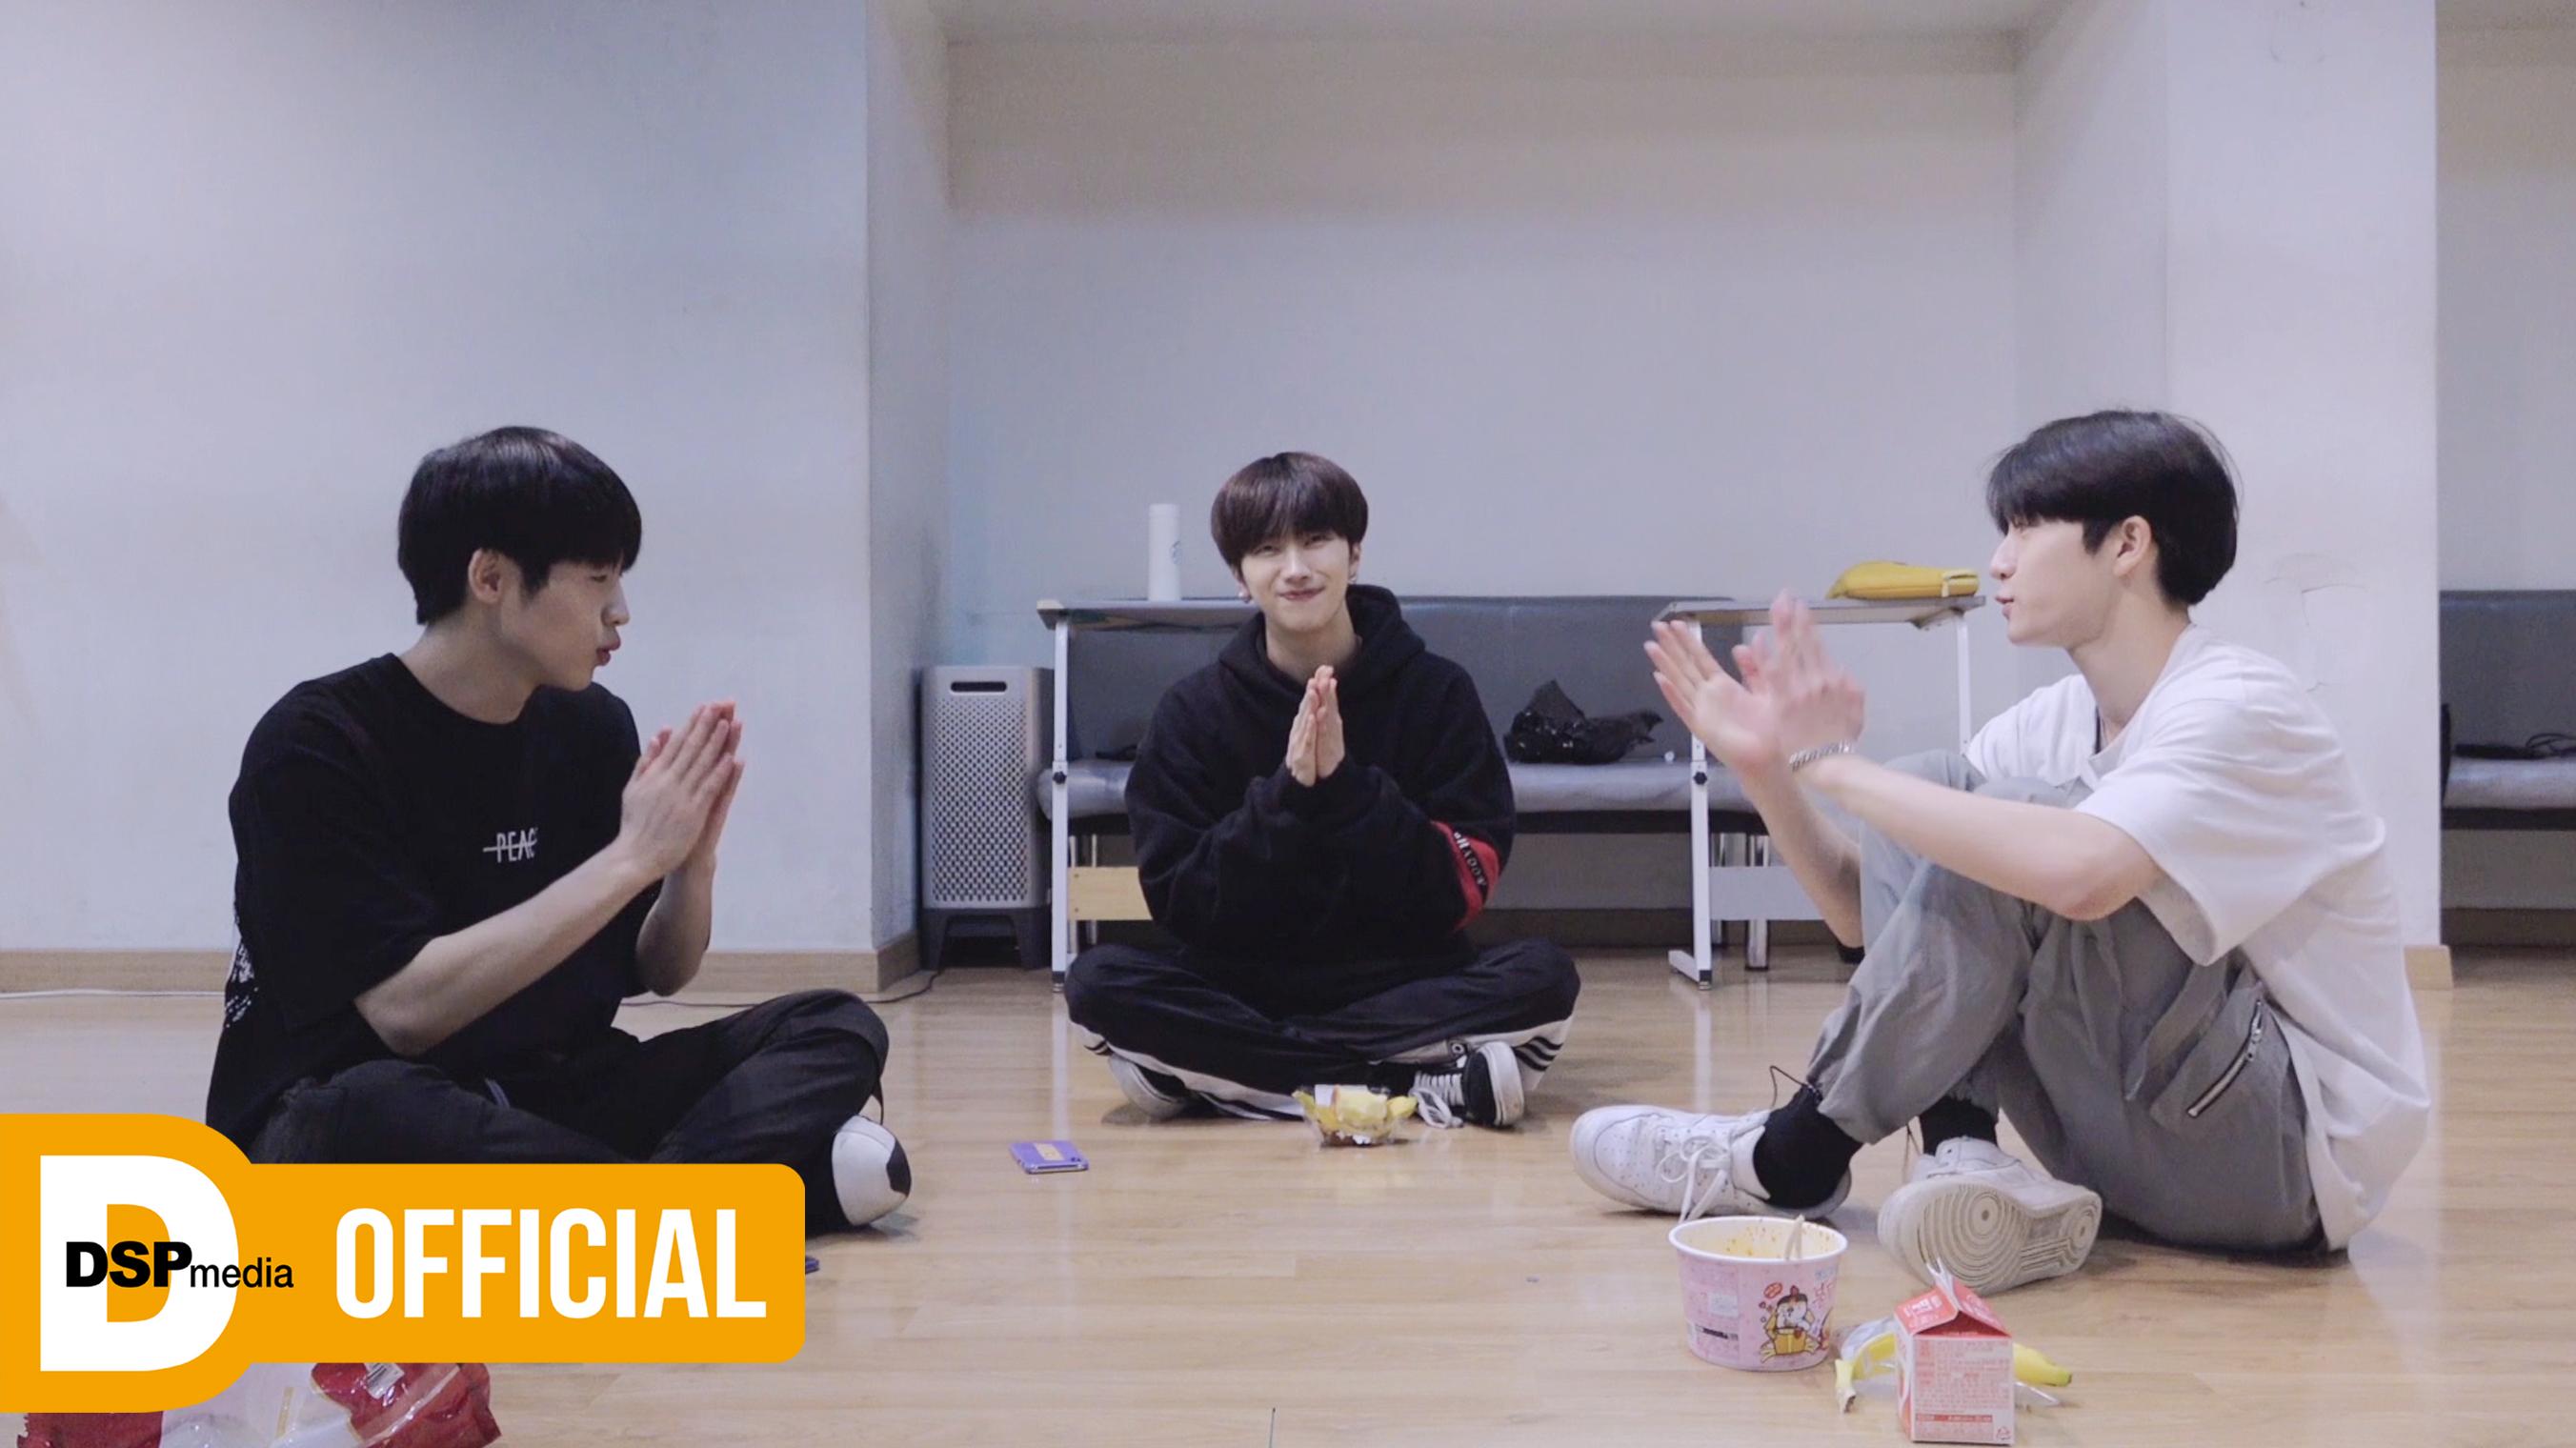 [N-log] EP.09 연습실에서 생긴 일 1편